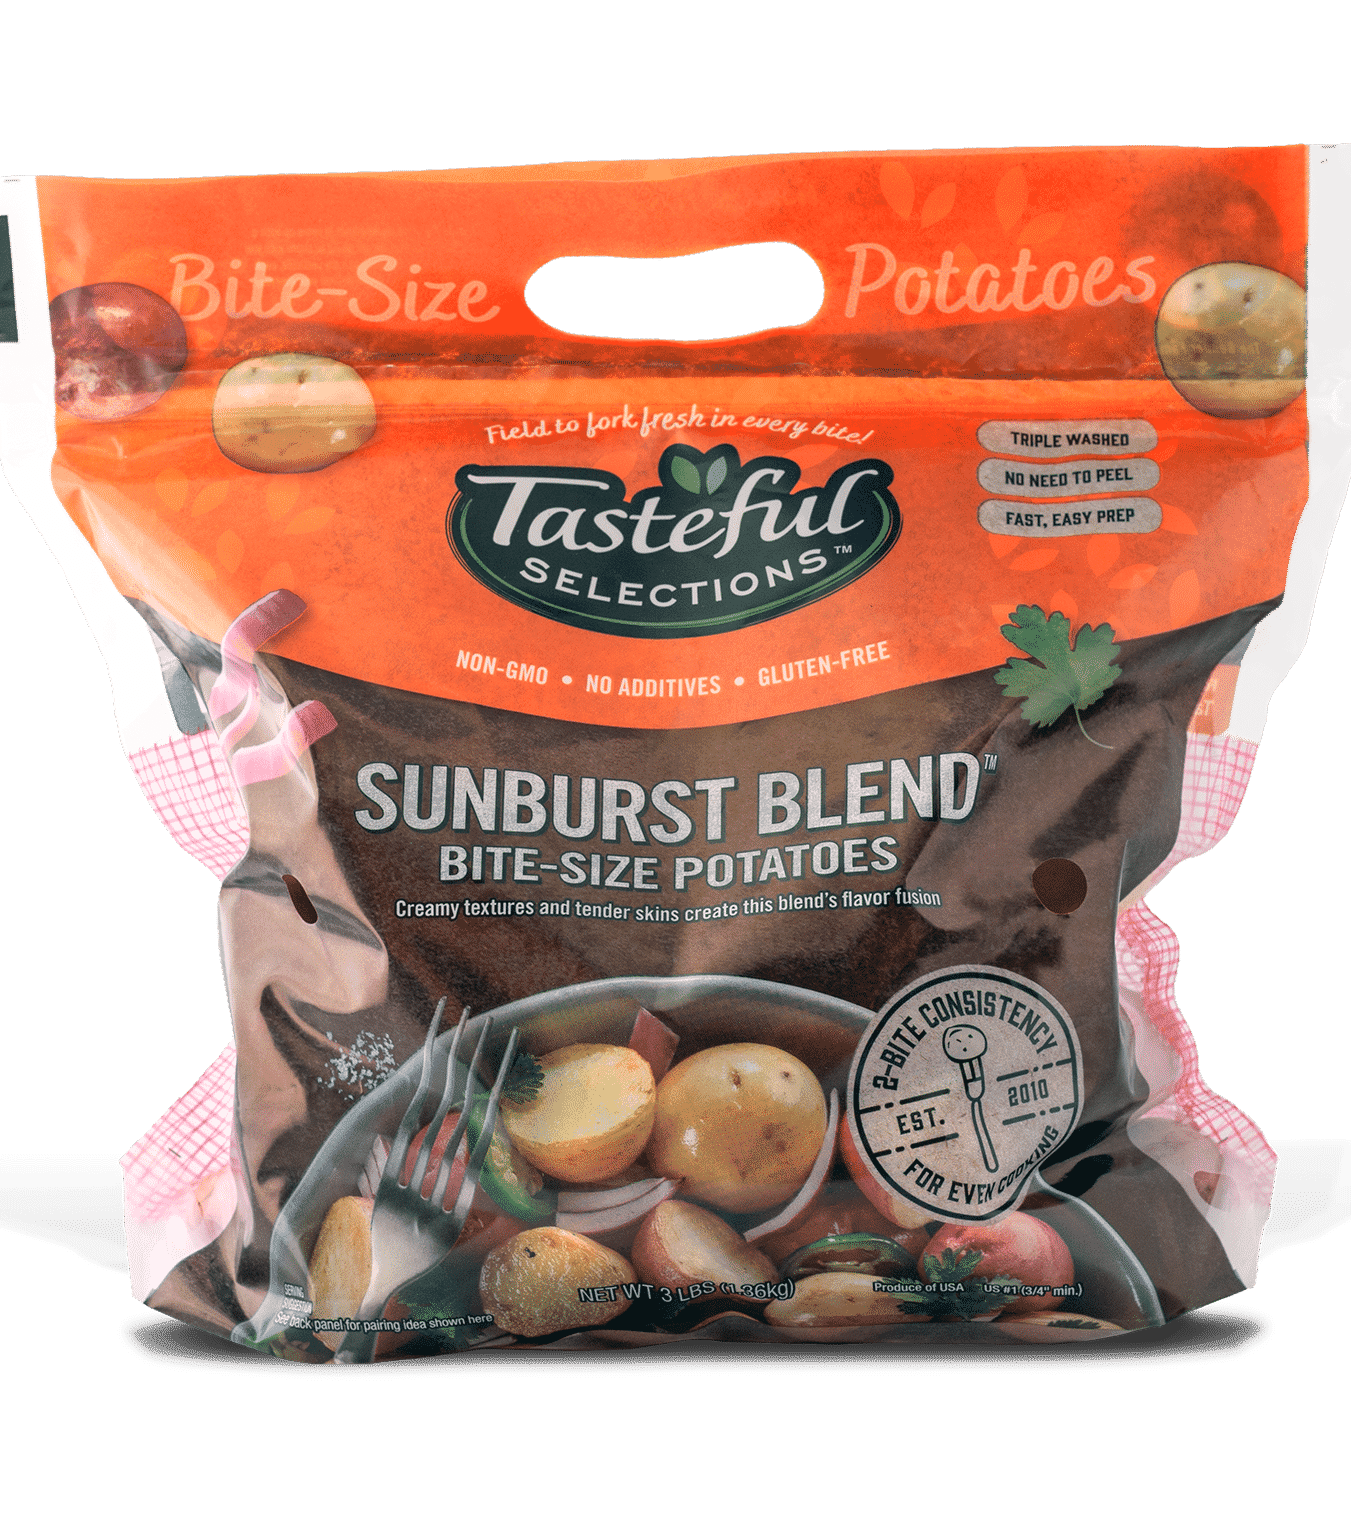 Tasteful Selections Sunburst Blend Bite-Size Potatoes Gusseted Bag 2-Bite – 3lbs